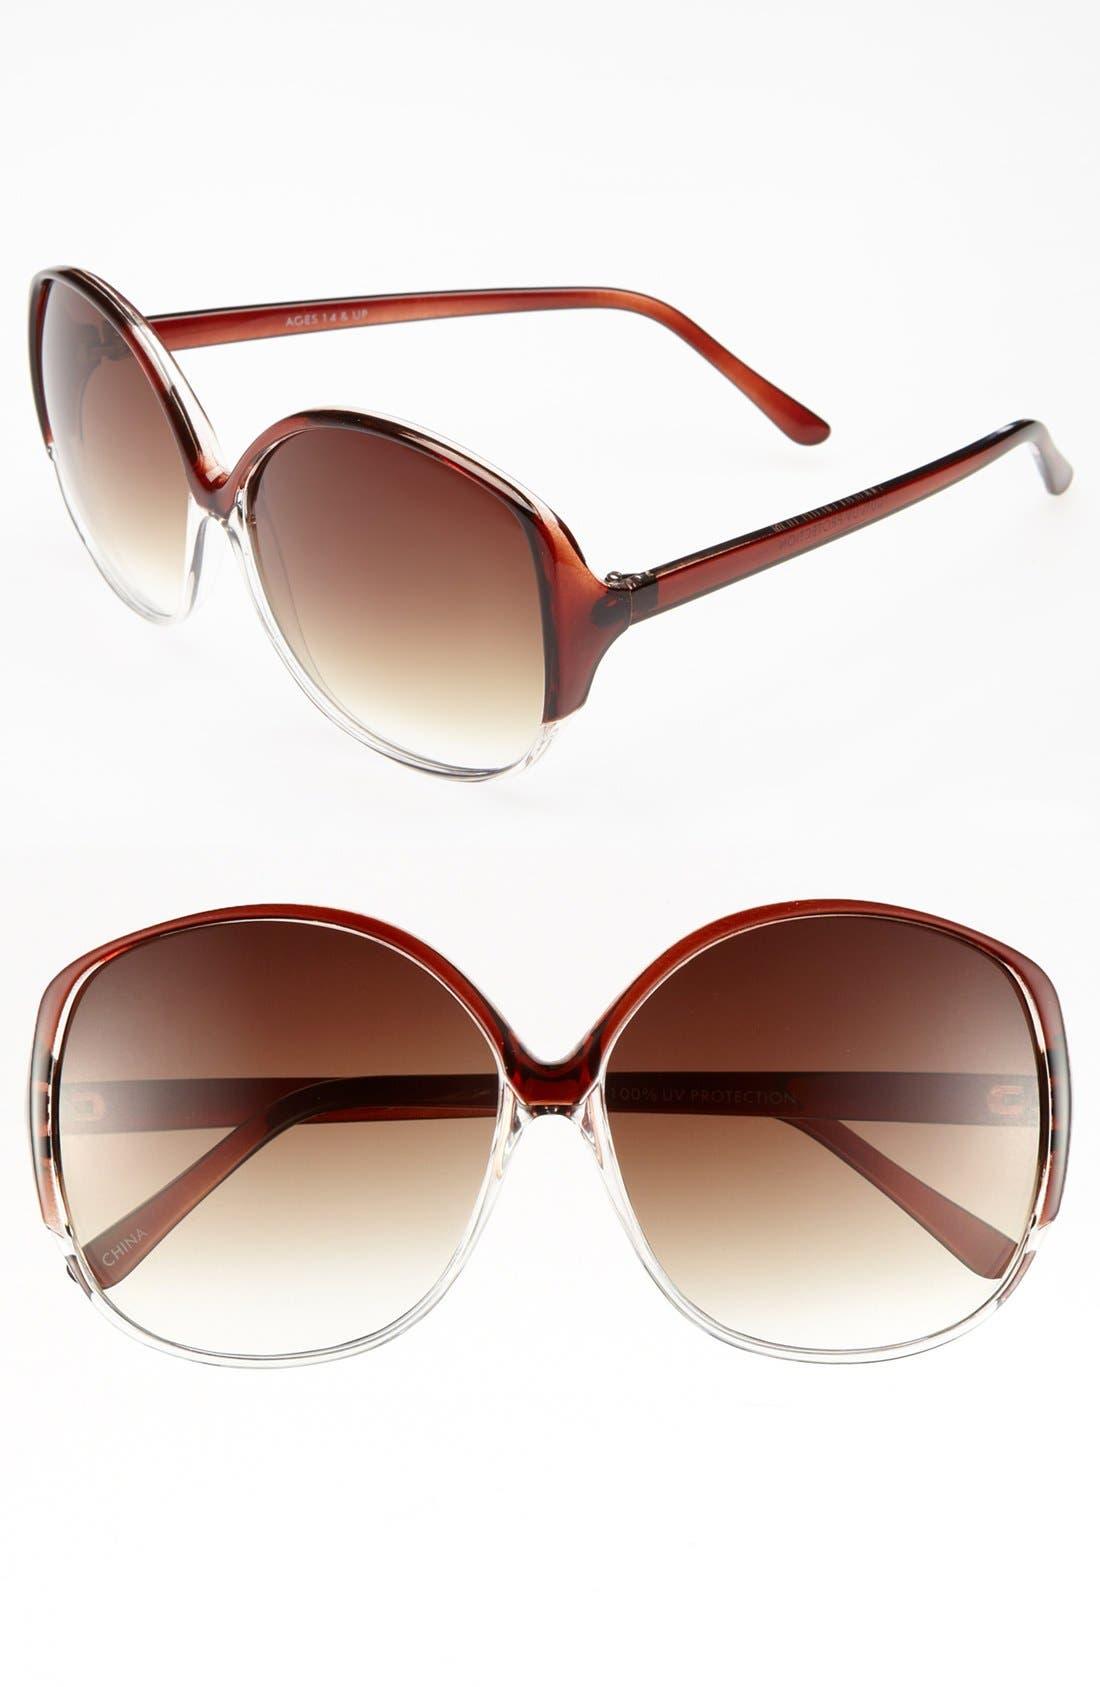 Main Image - FE NY 'Tampani' Sunglasses